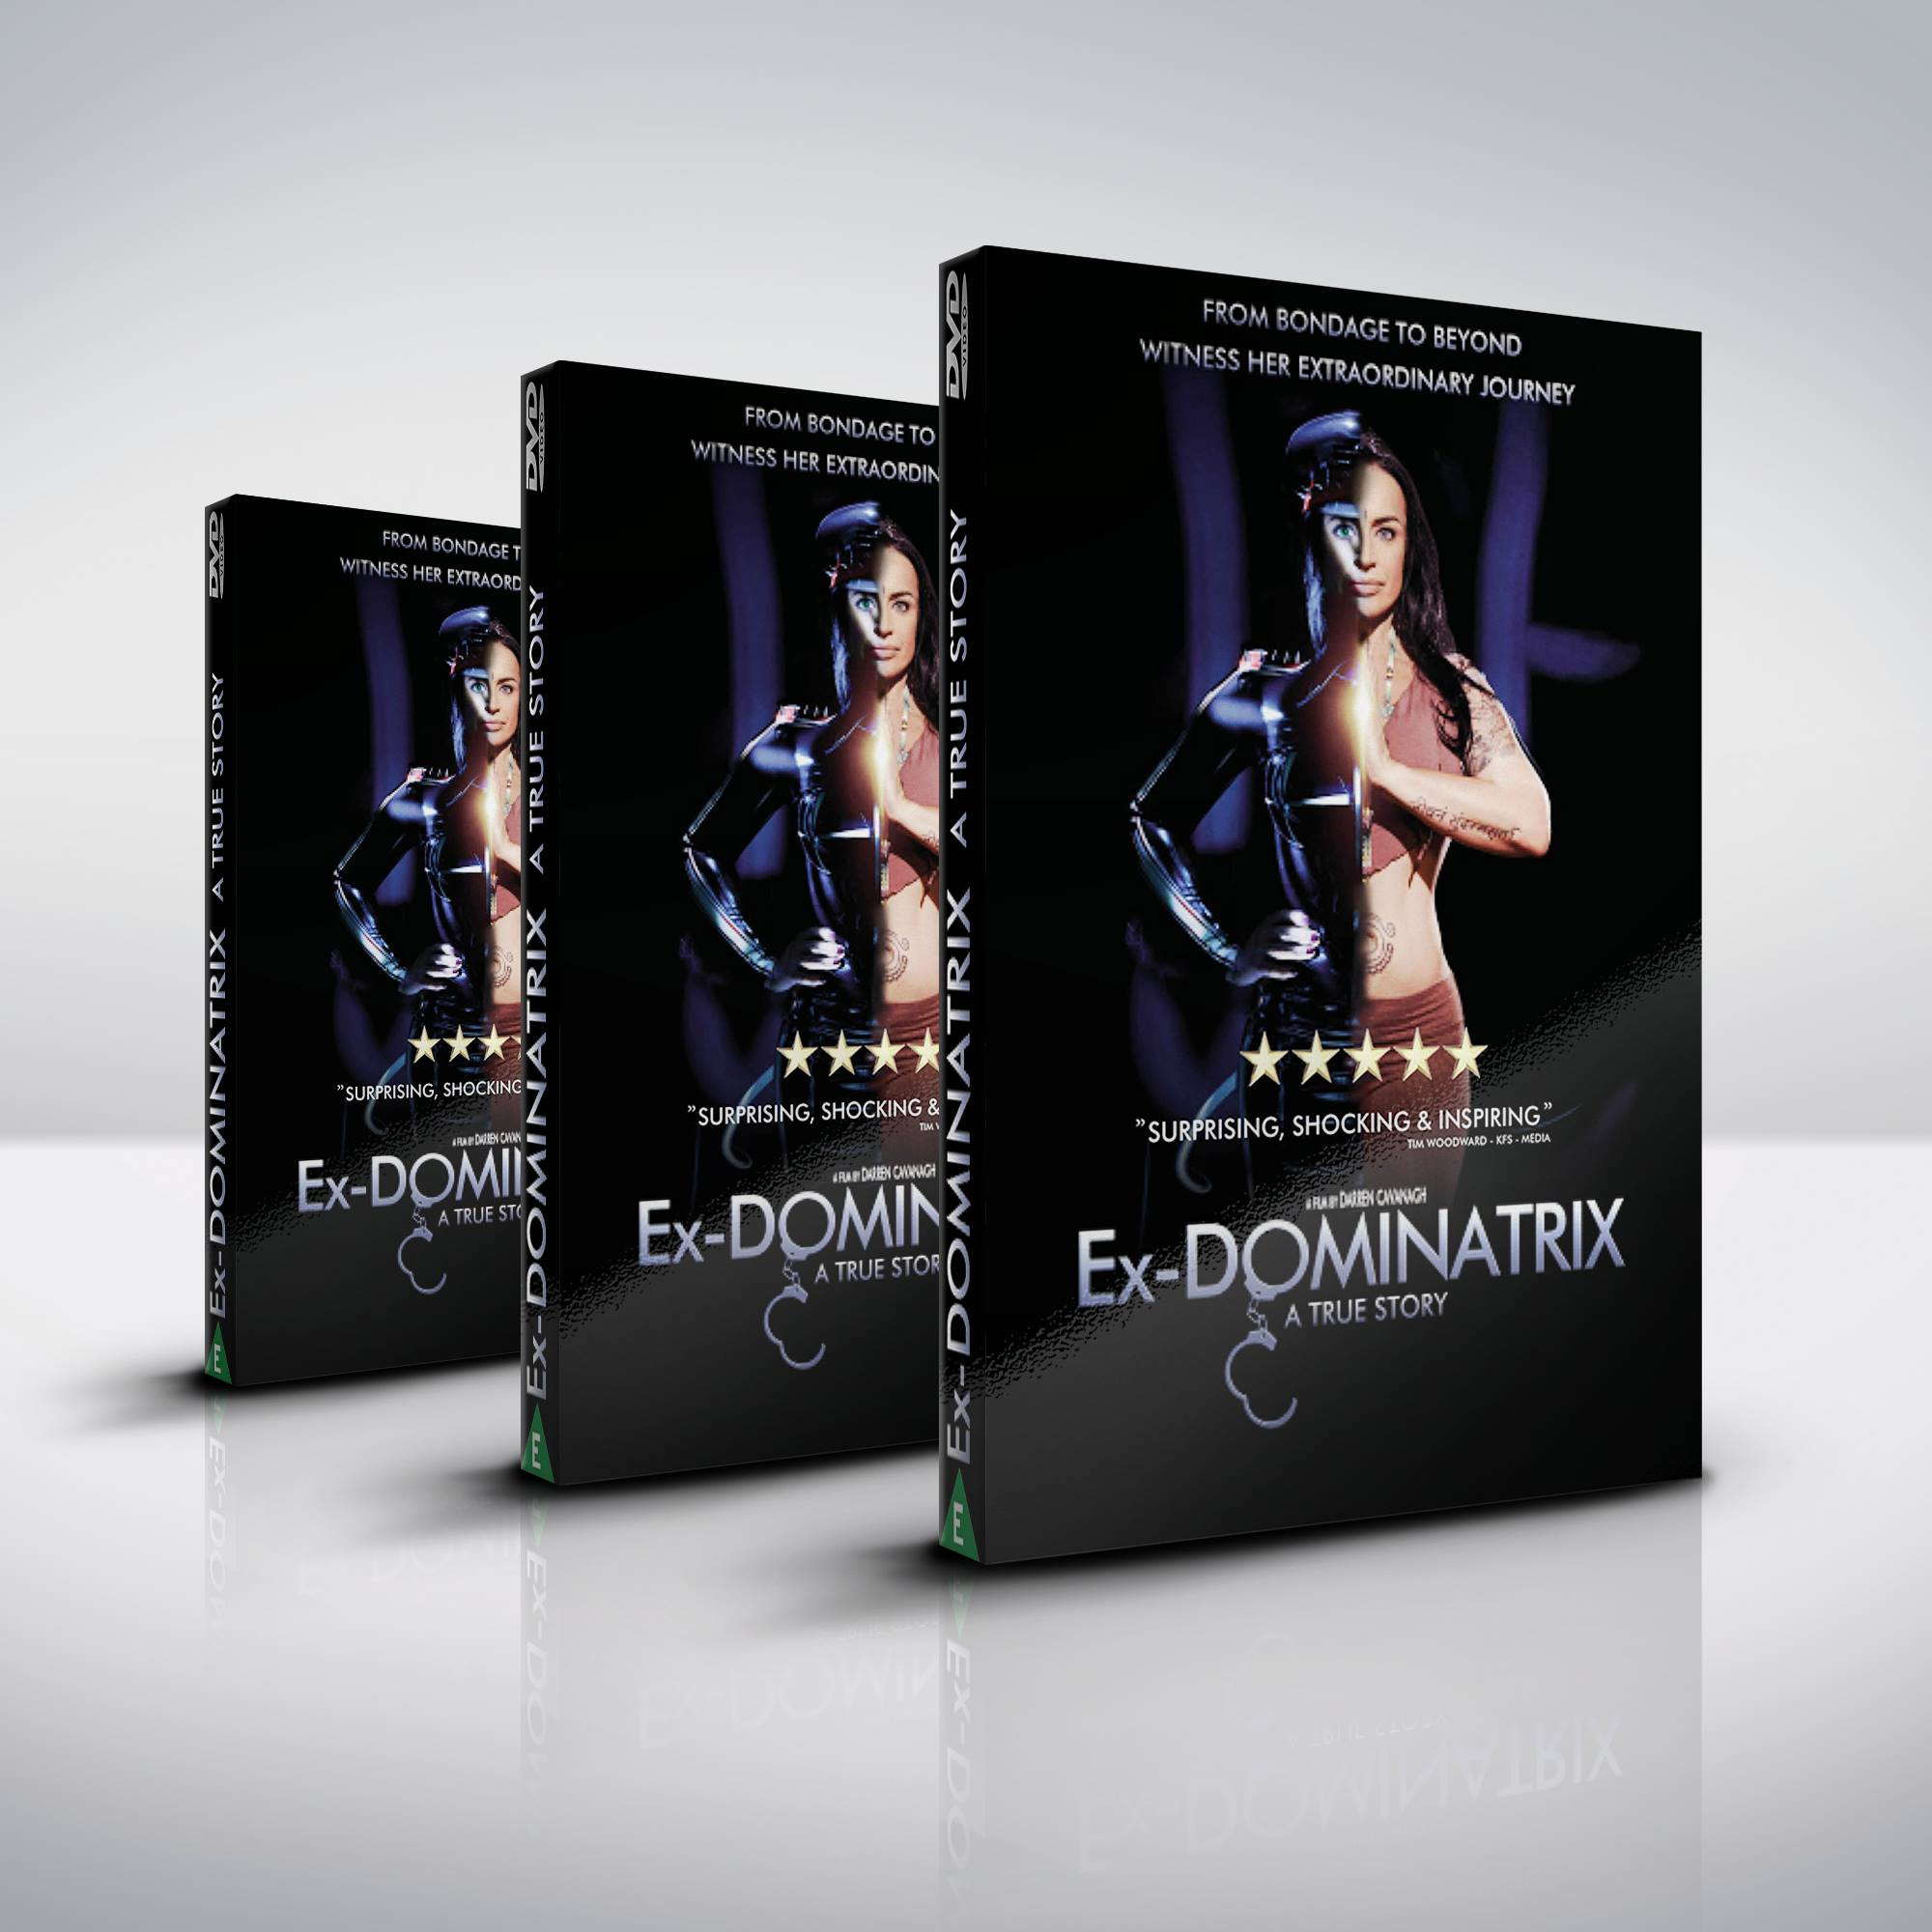 ex-dominatrix 0713325611416